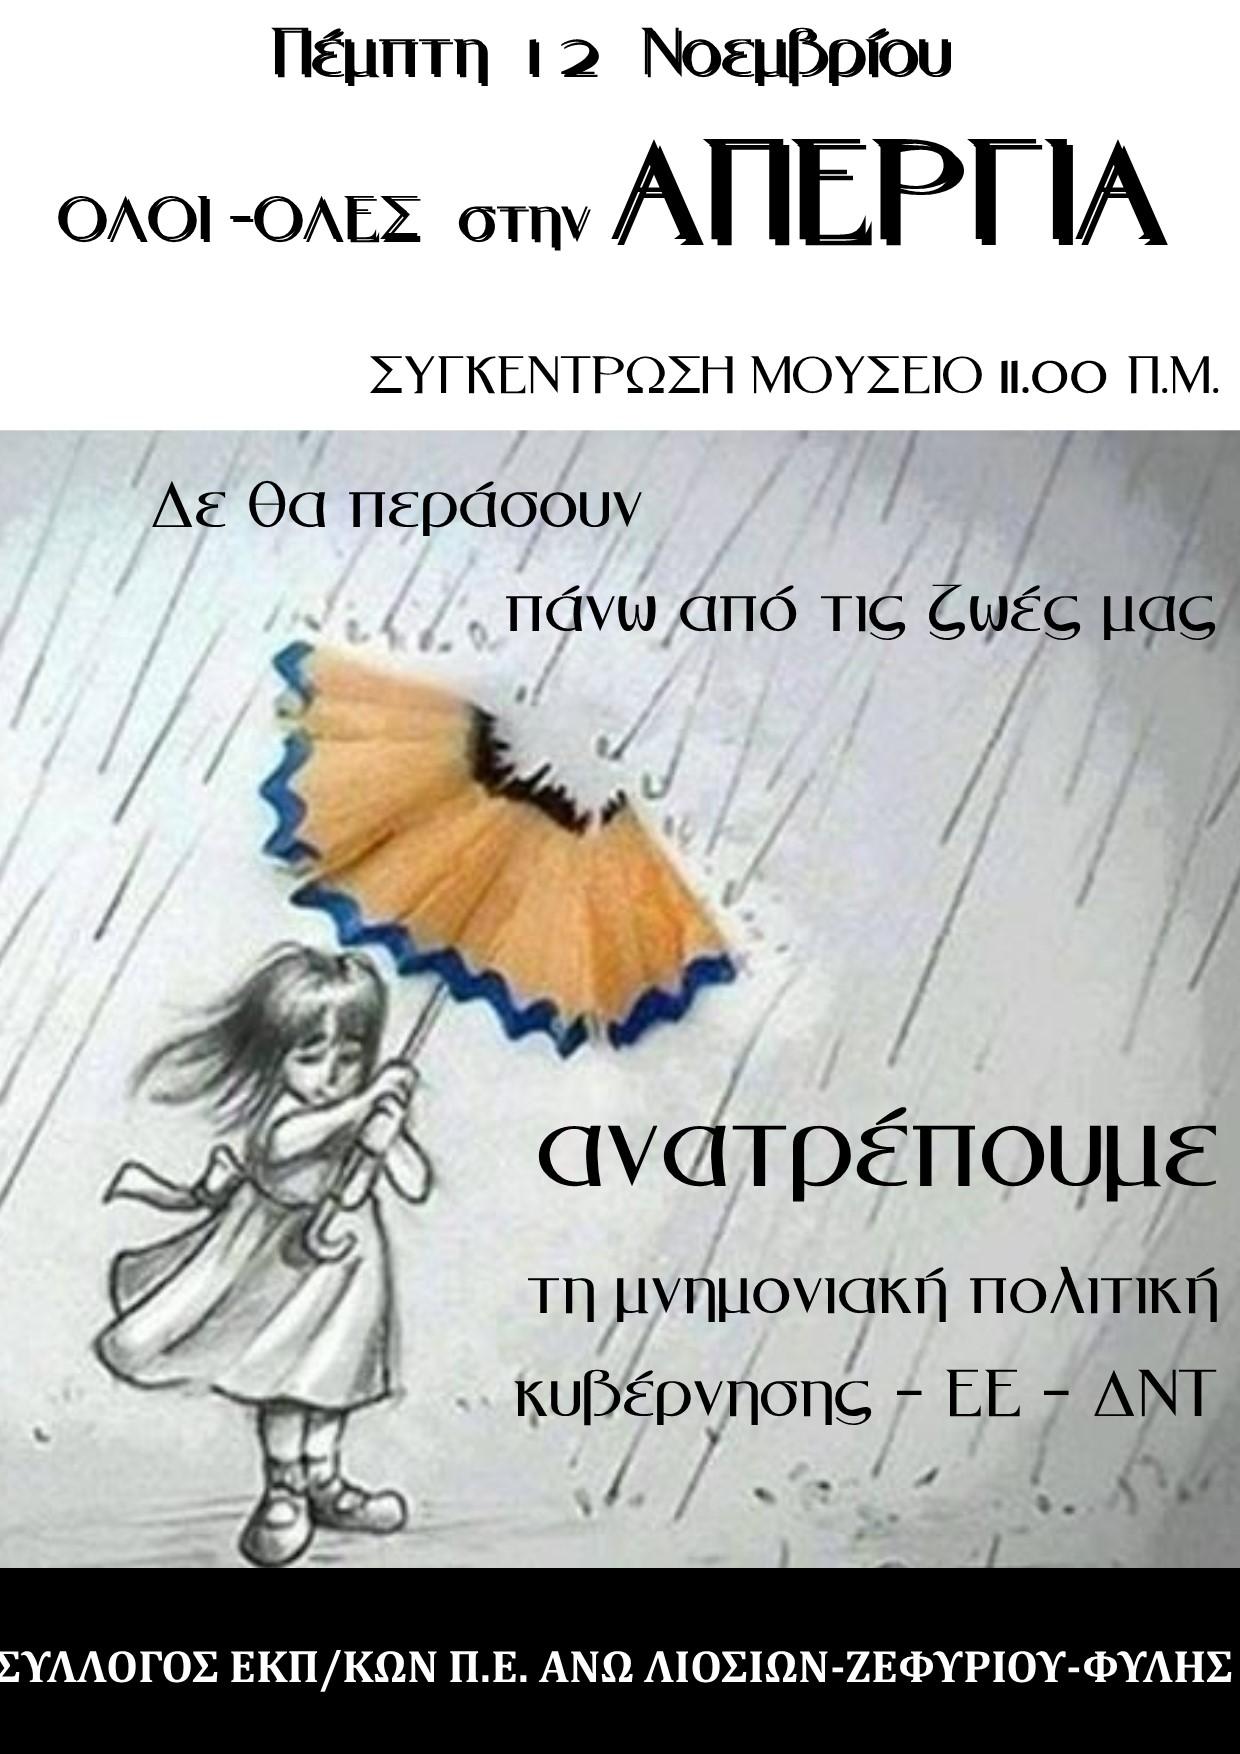 151112_ap